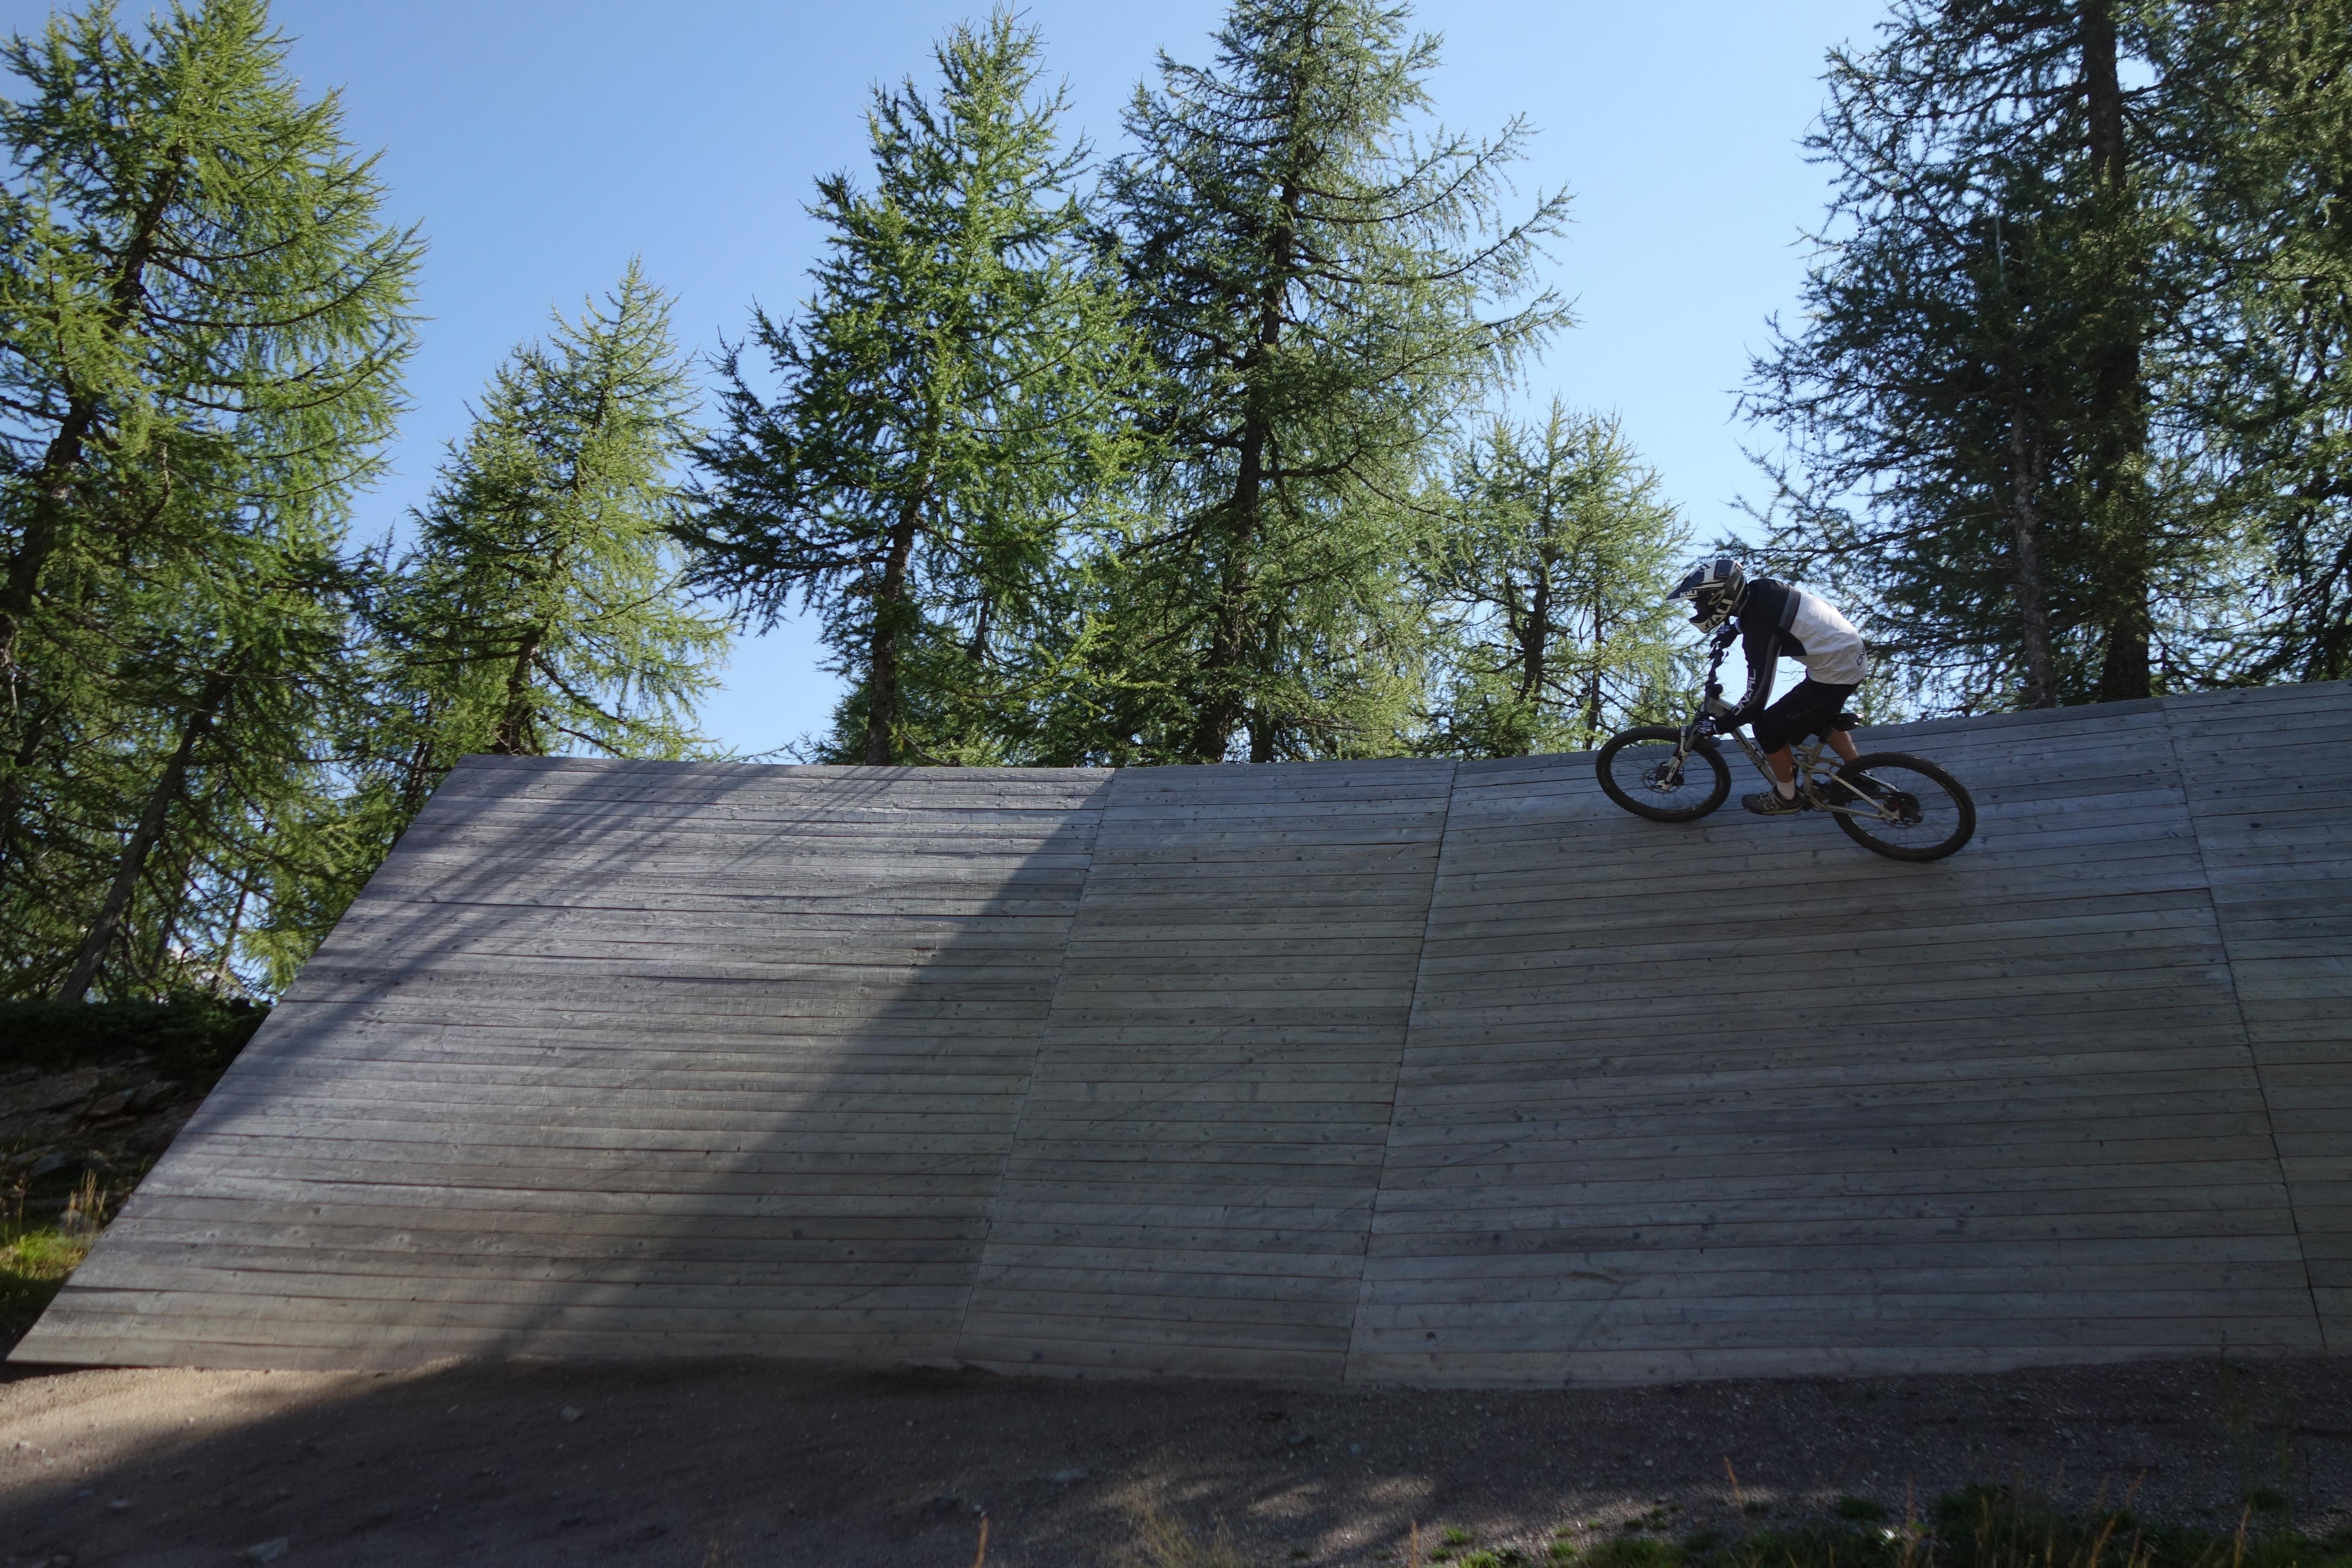 dolomiten st. martin mtb downhill freeride